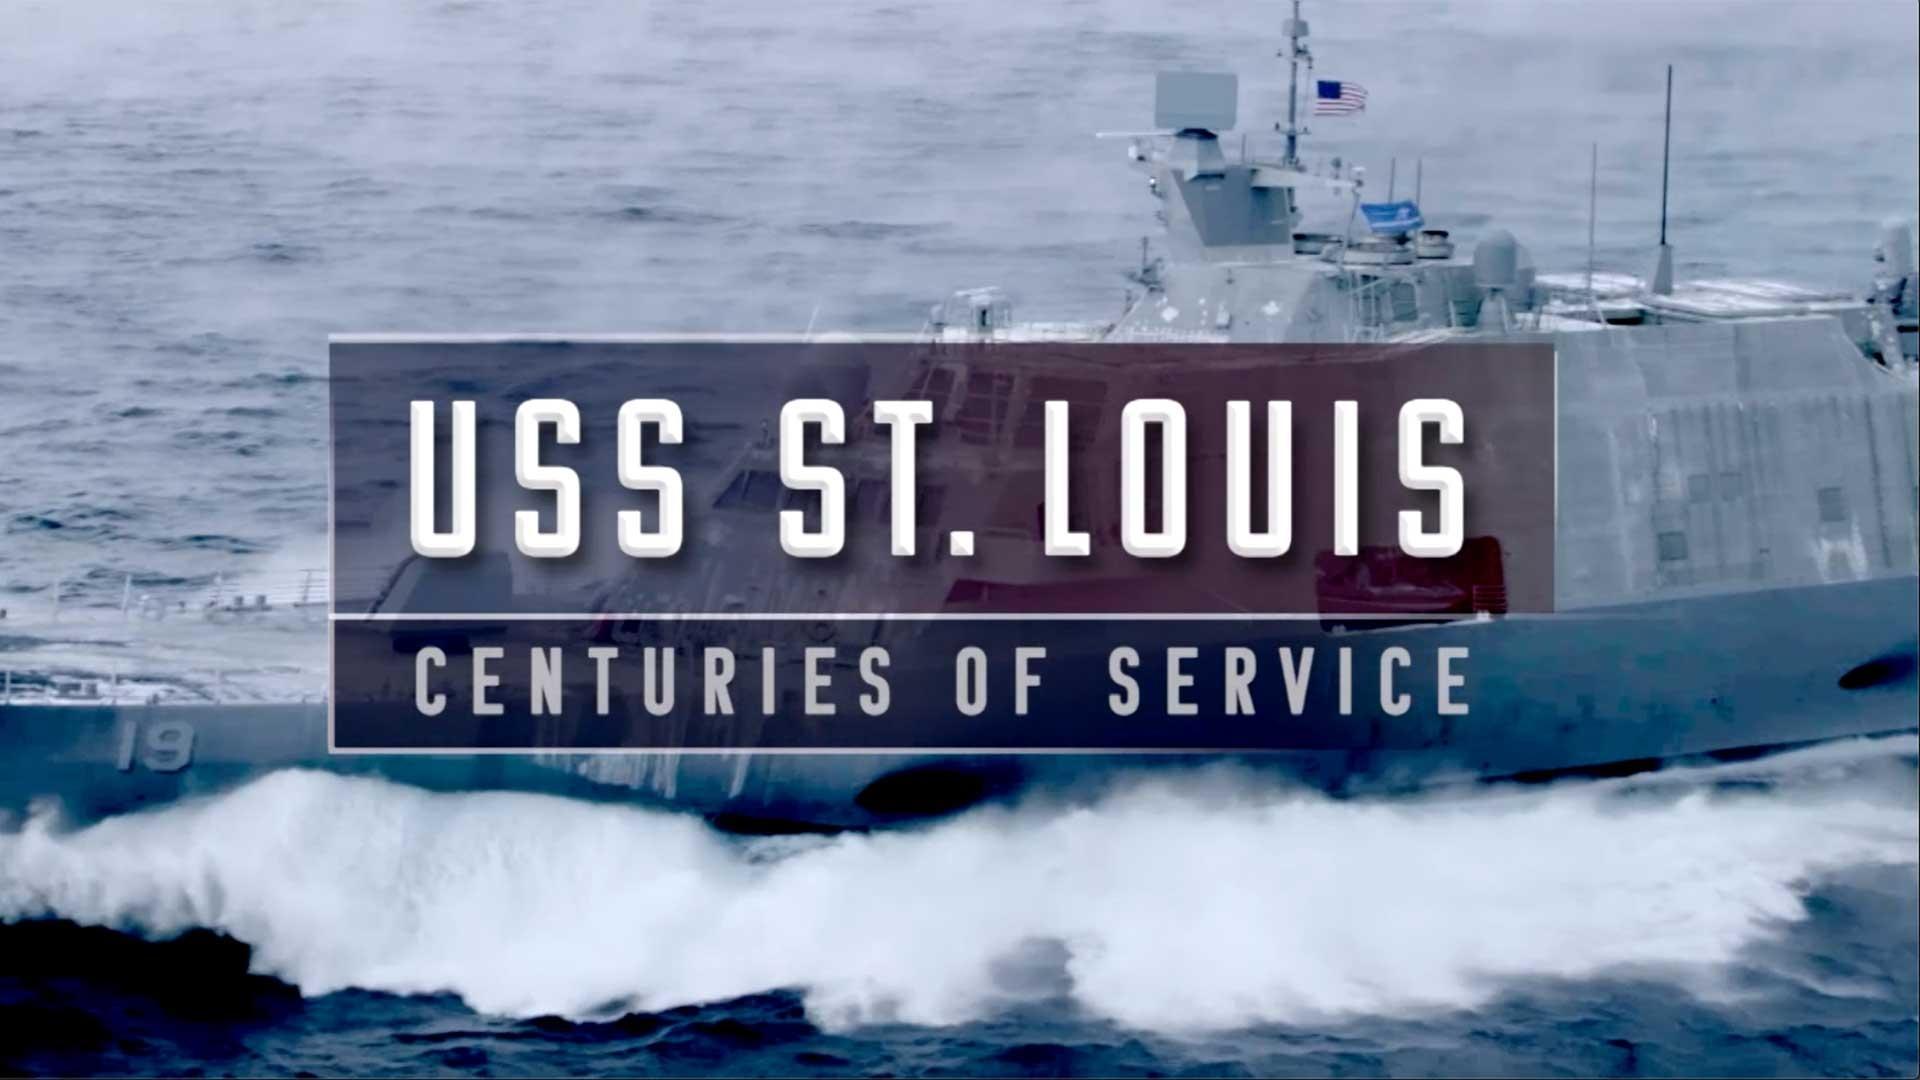 USS St. Louis: Centuries of Service